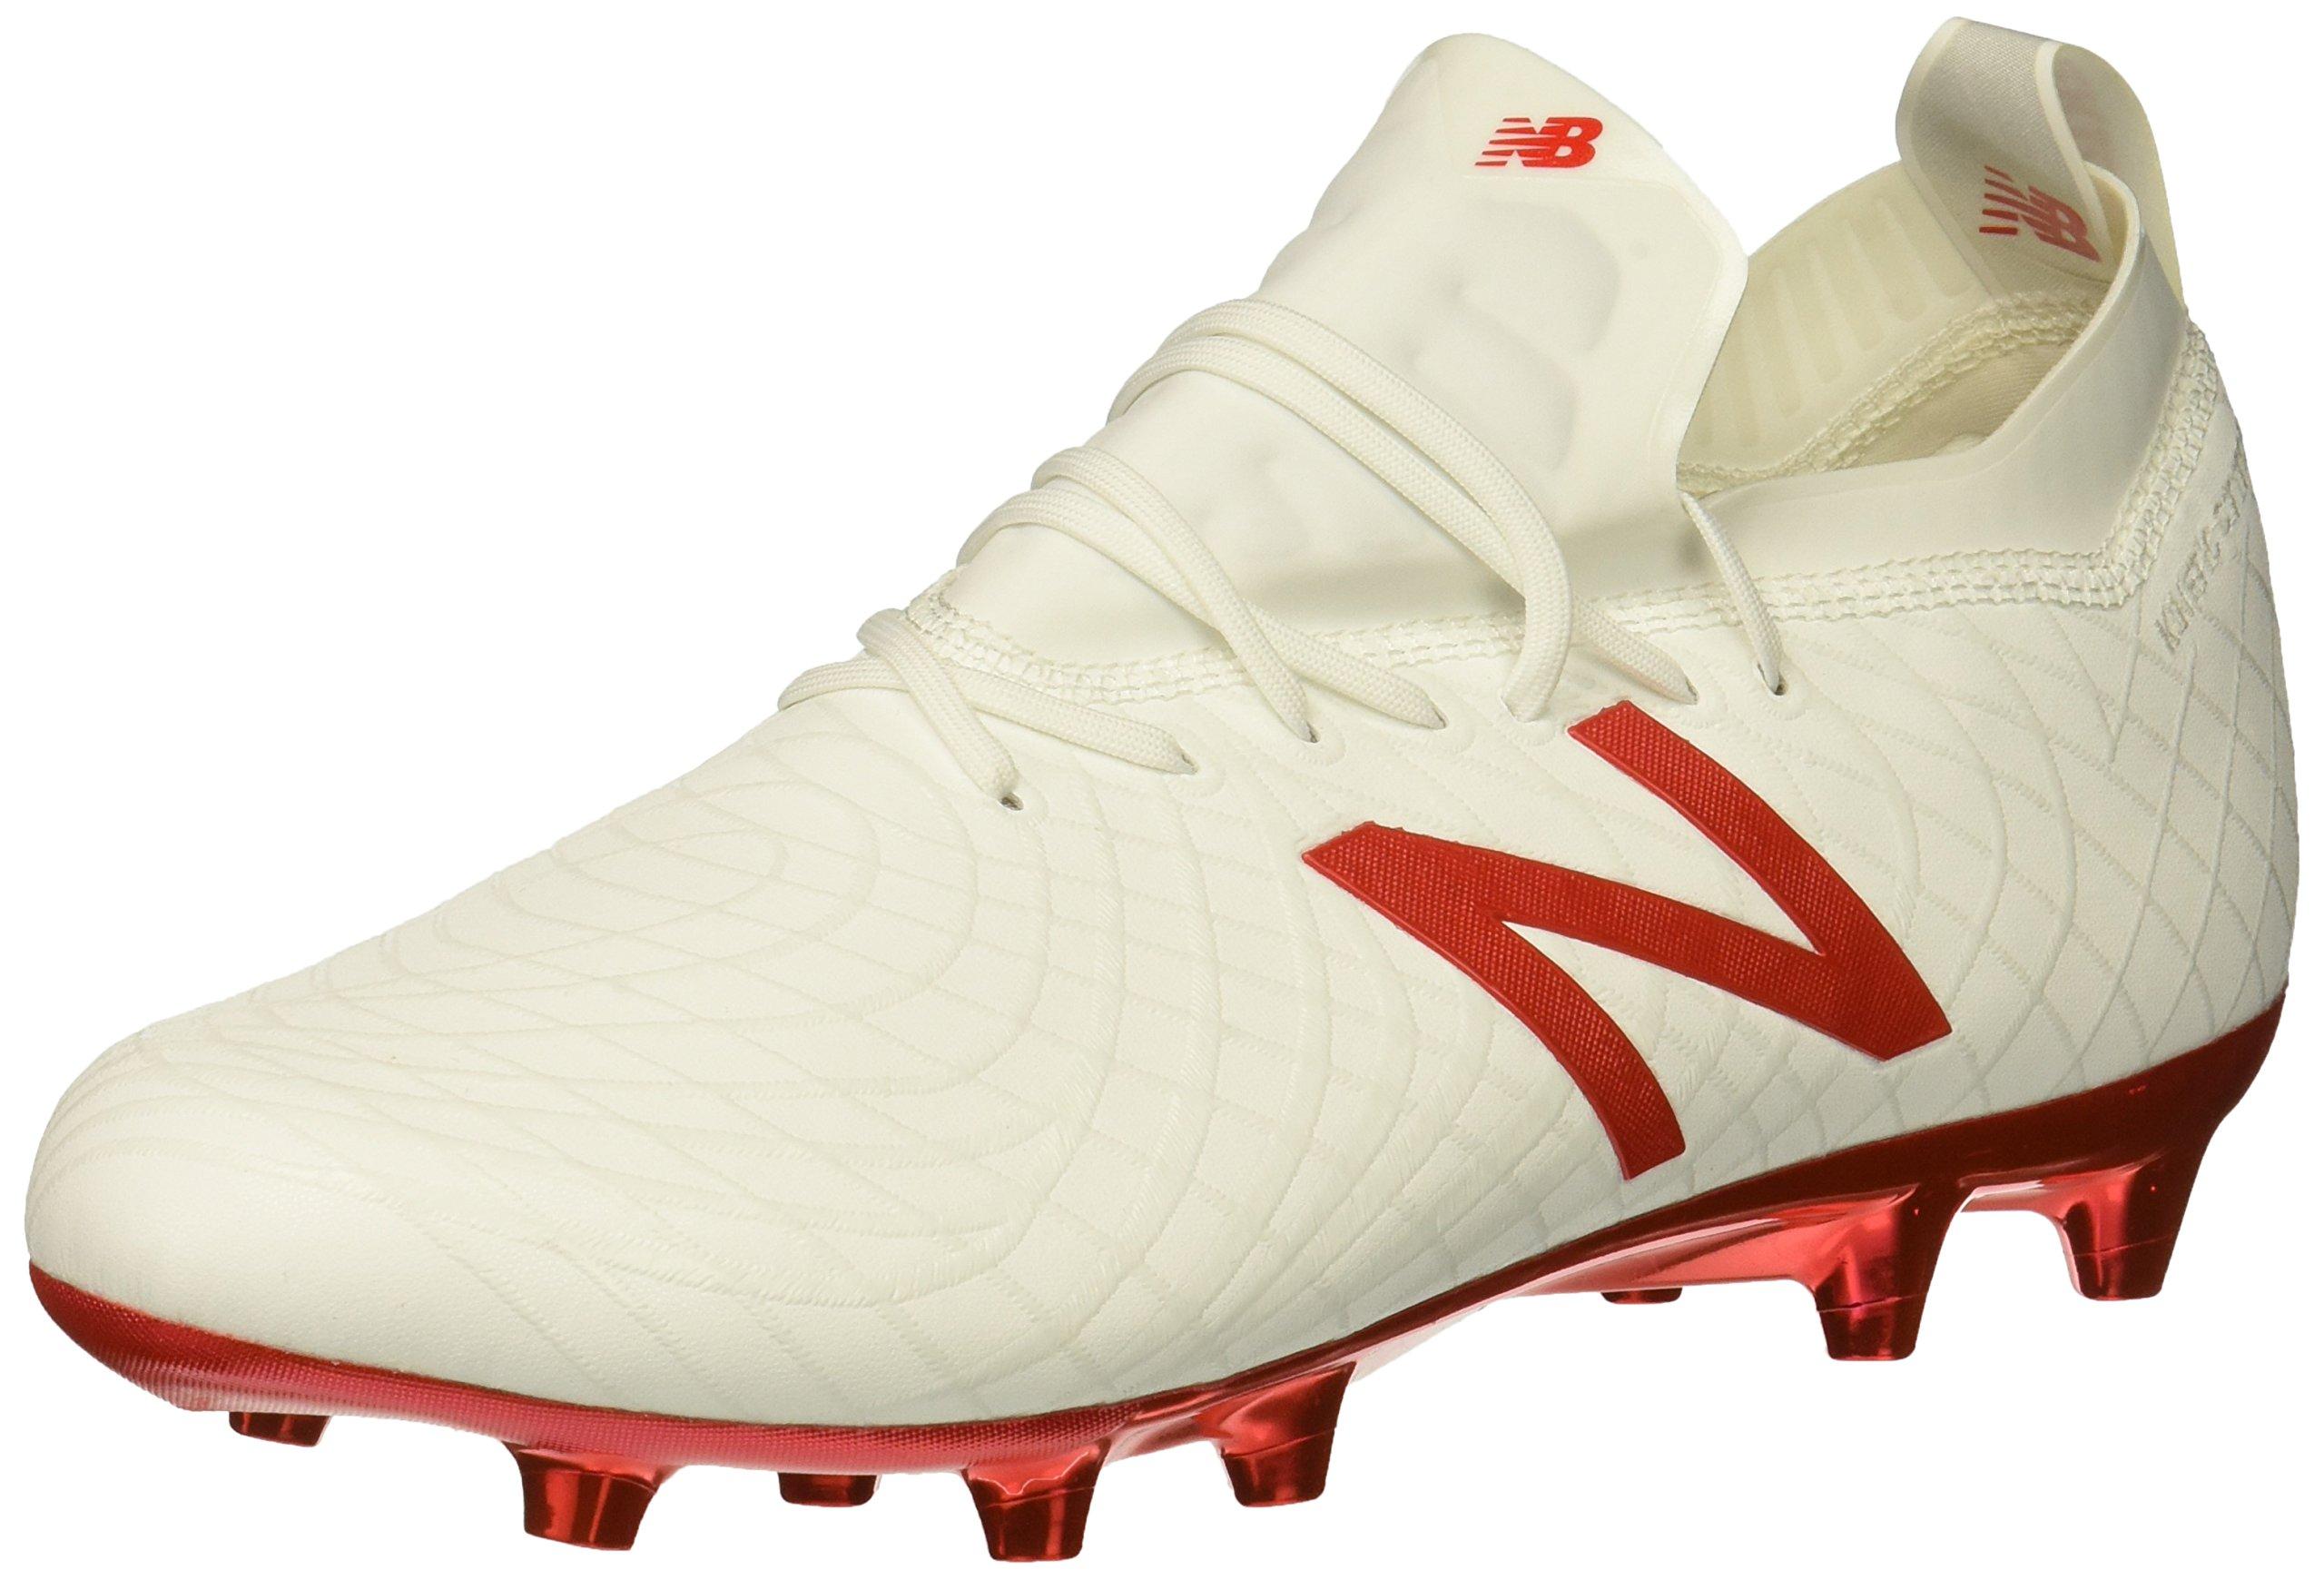 New Balance Men's Tekela 1.0 Pro FG Soccer Shoe, White/Flame Orange, 7.5 2E US